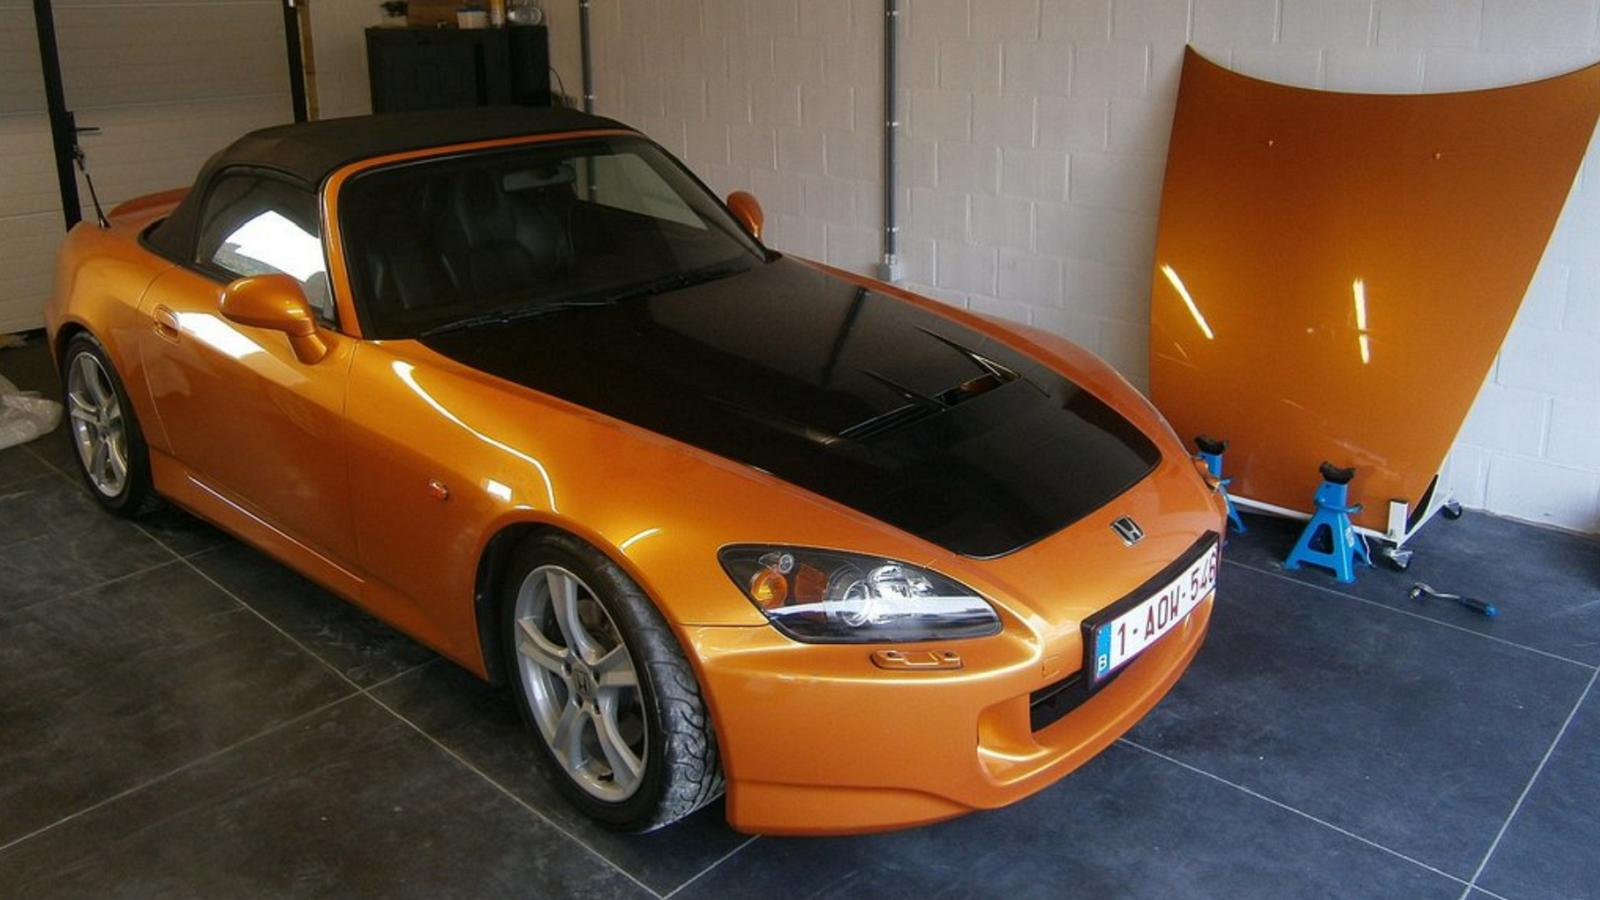 Imola Orange S2000 Joins Impressive Honda Collection